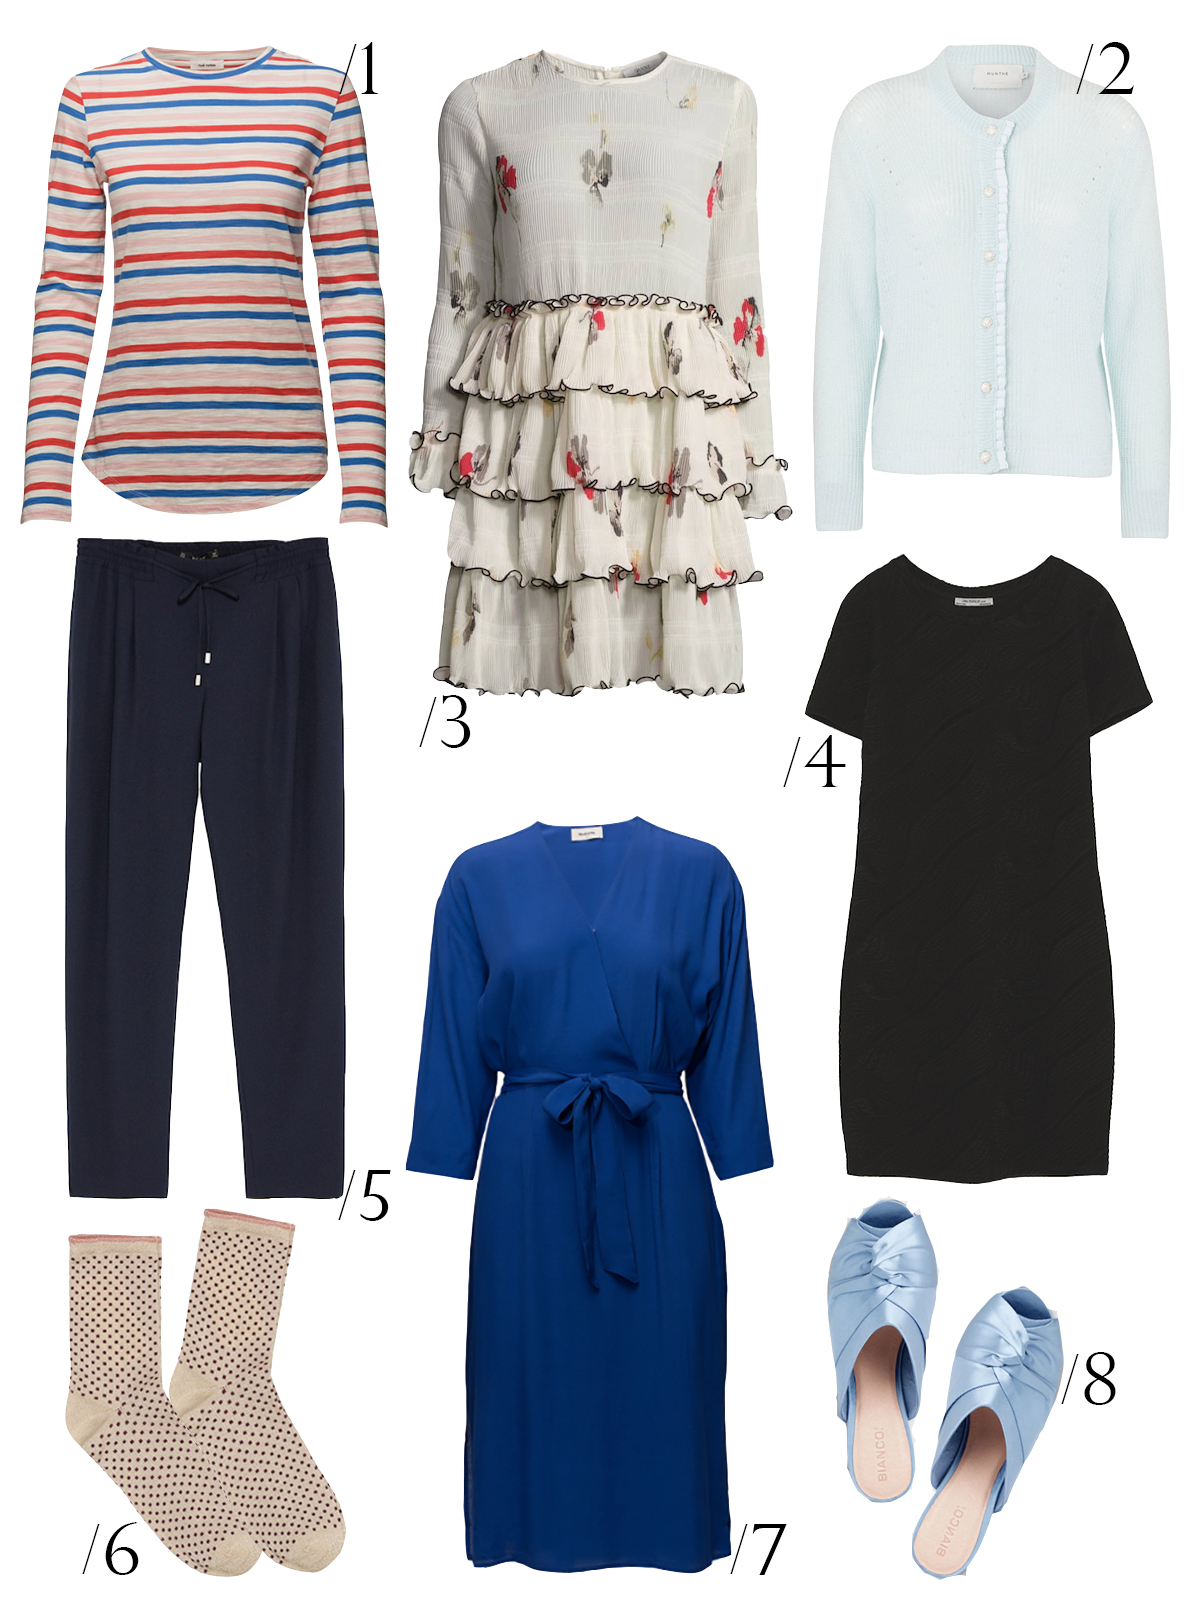 marts-garderoberegnskab